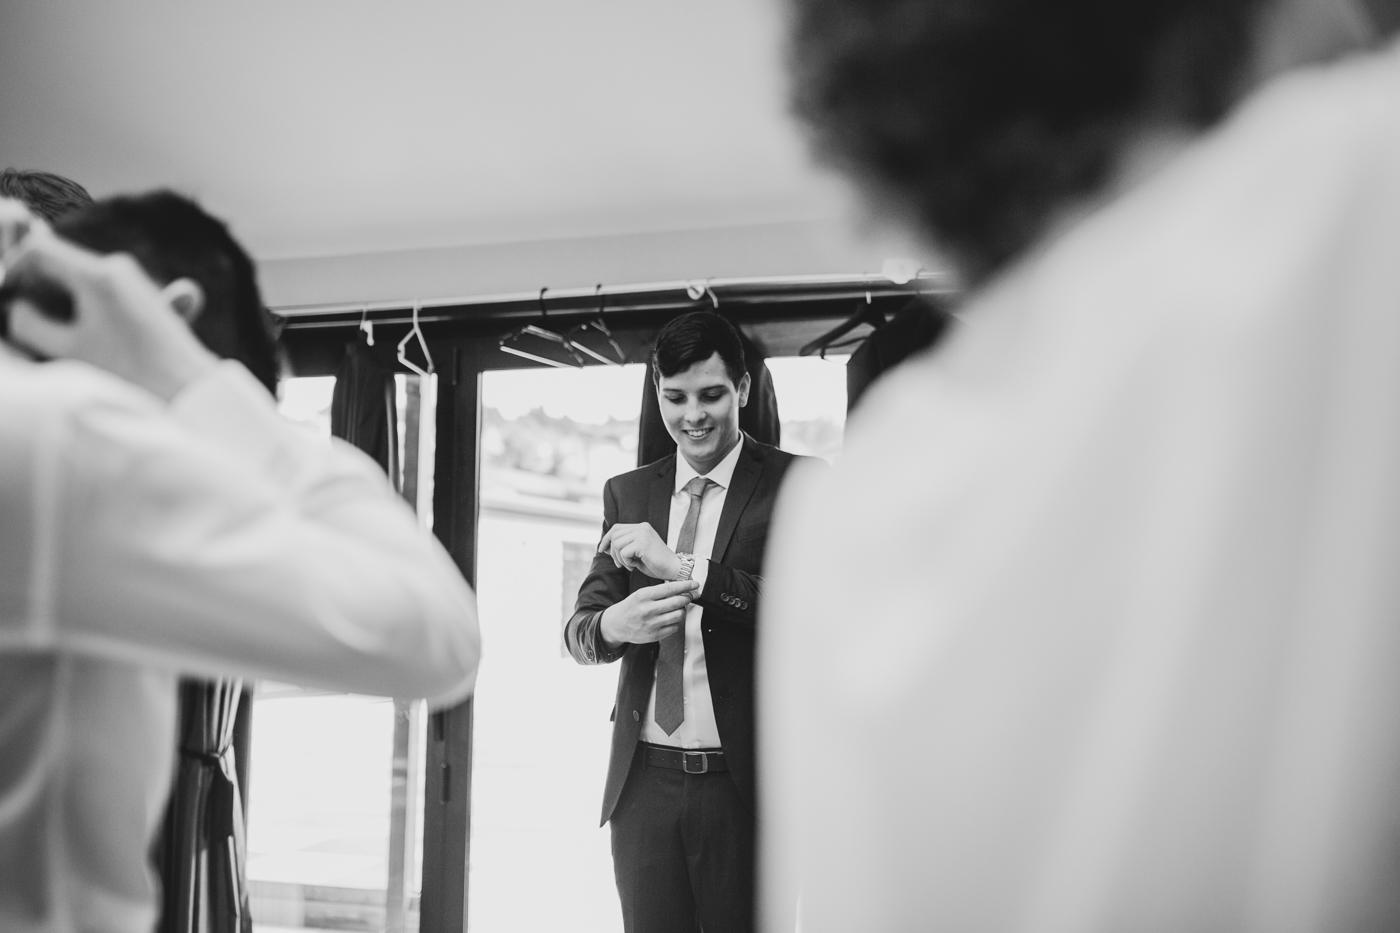 Ariana & Tim - Dunedin, New Zealand Wedding - Destination Wedding - Samantha Heather Photography-20.jpg